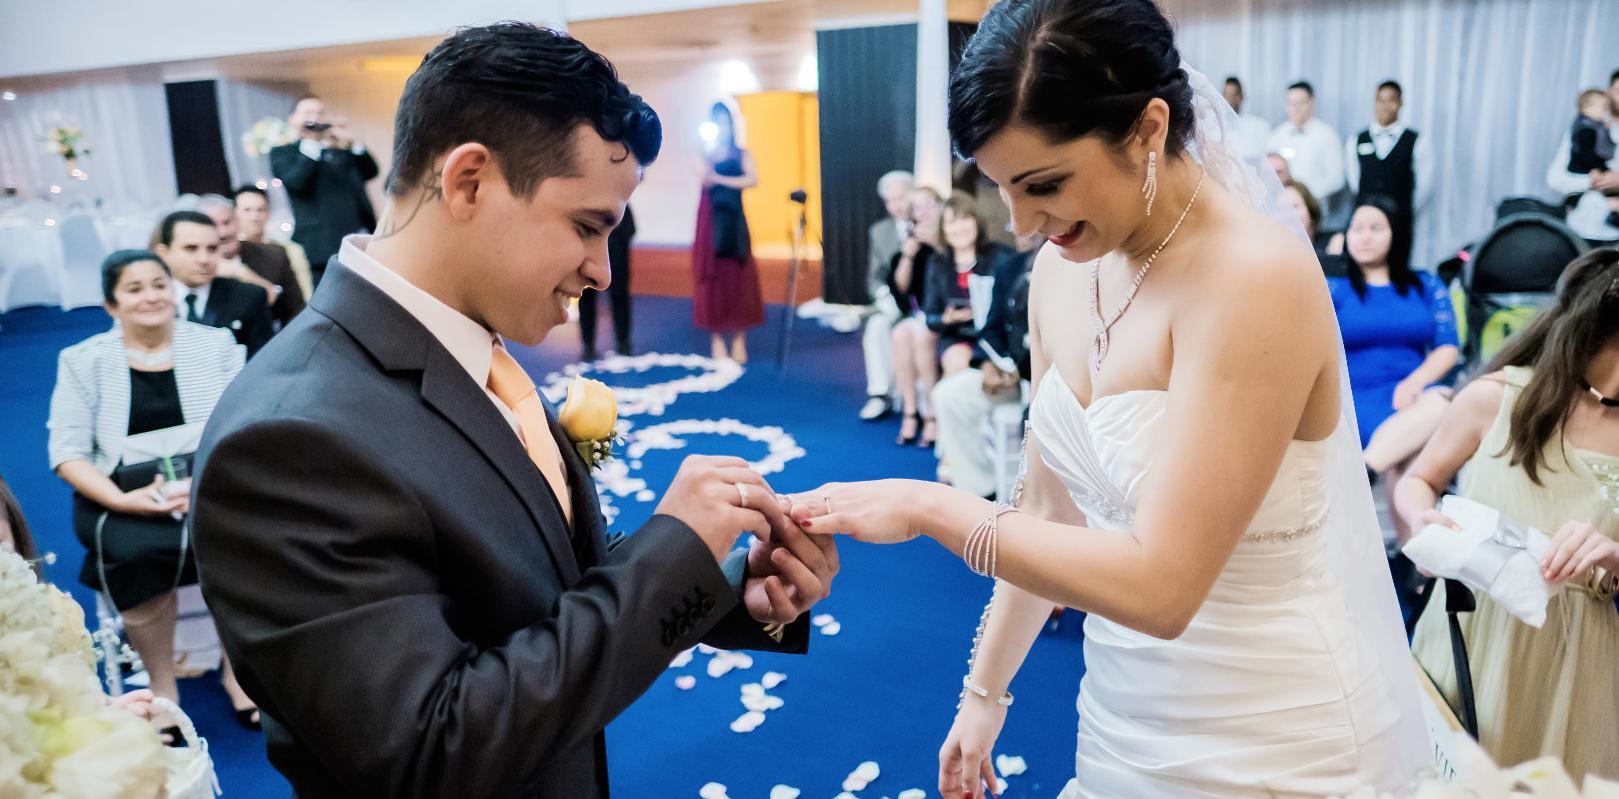 bodas-sin-clasificar-sin-tema-cuba-25741.jpg